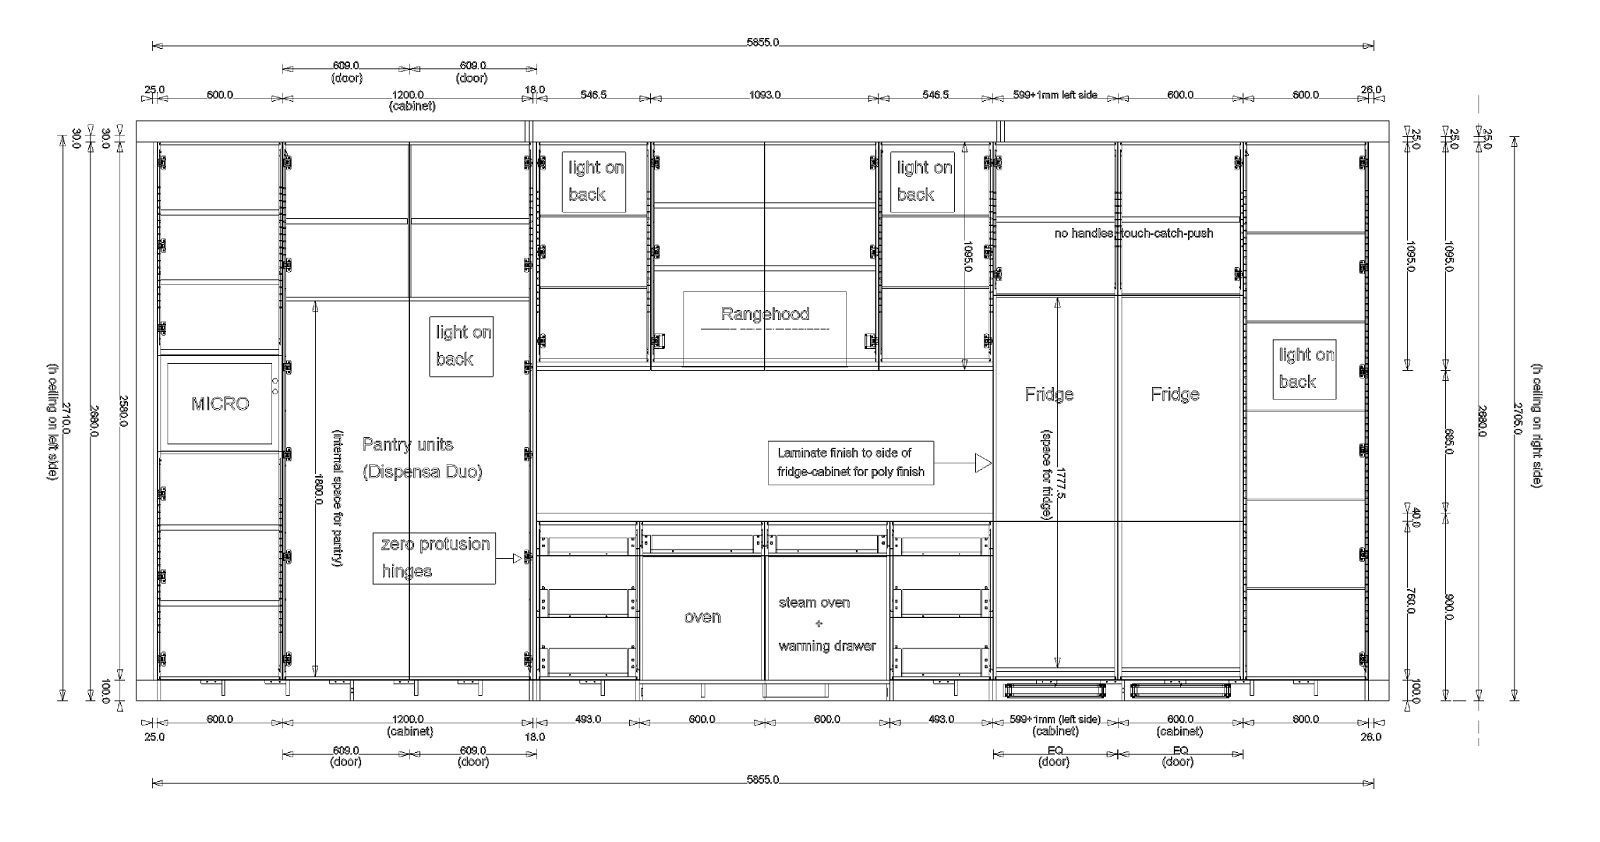 ... Furniture Design Software / CAD / For Concrete Structures ...